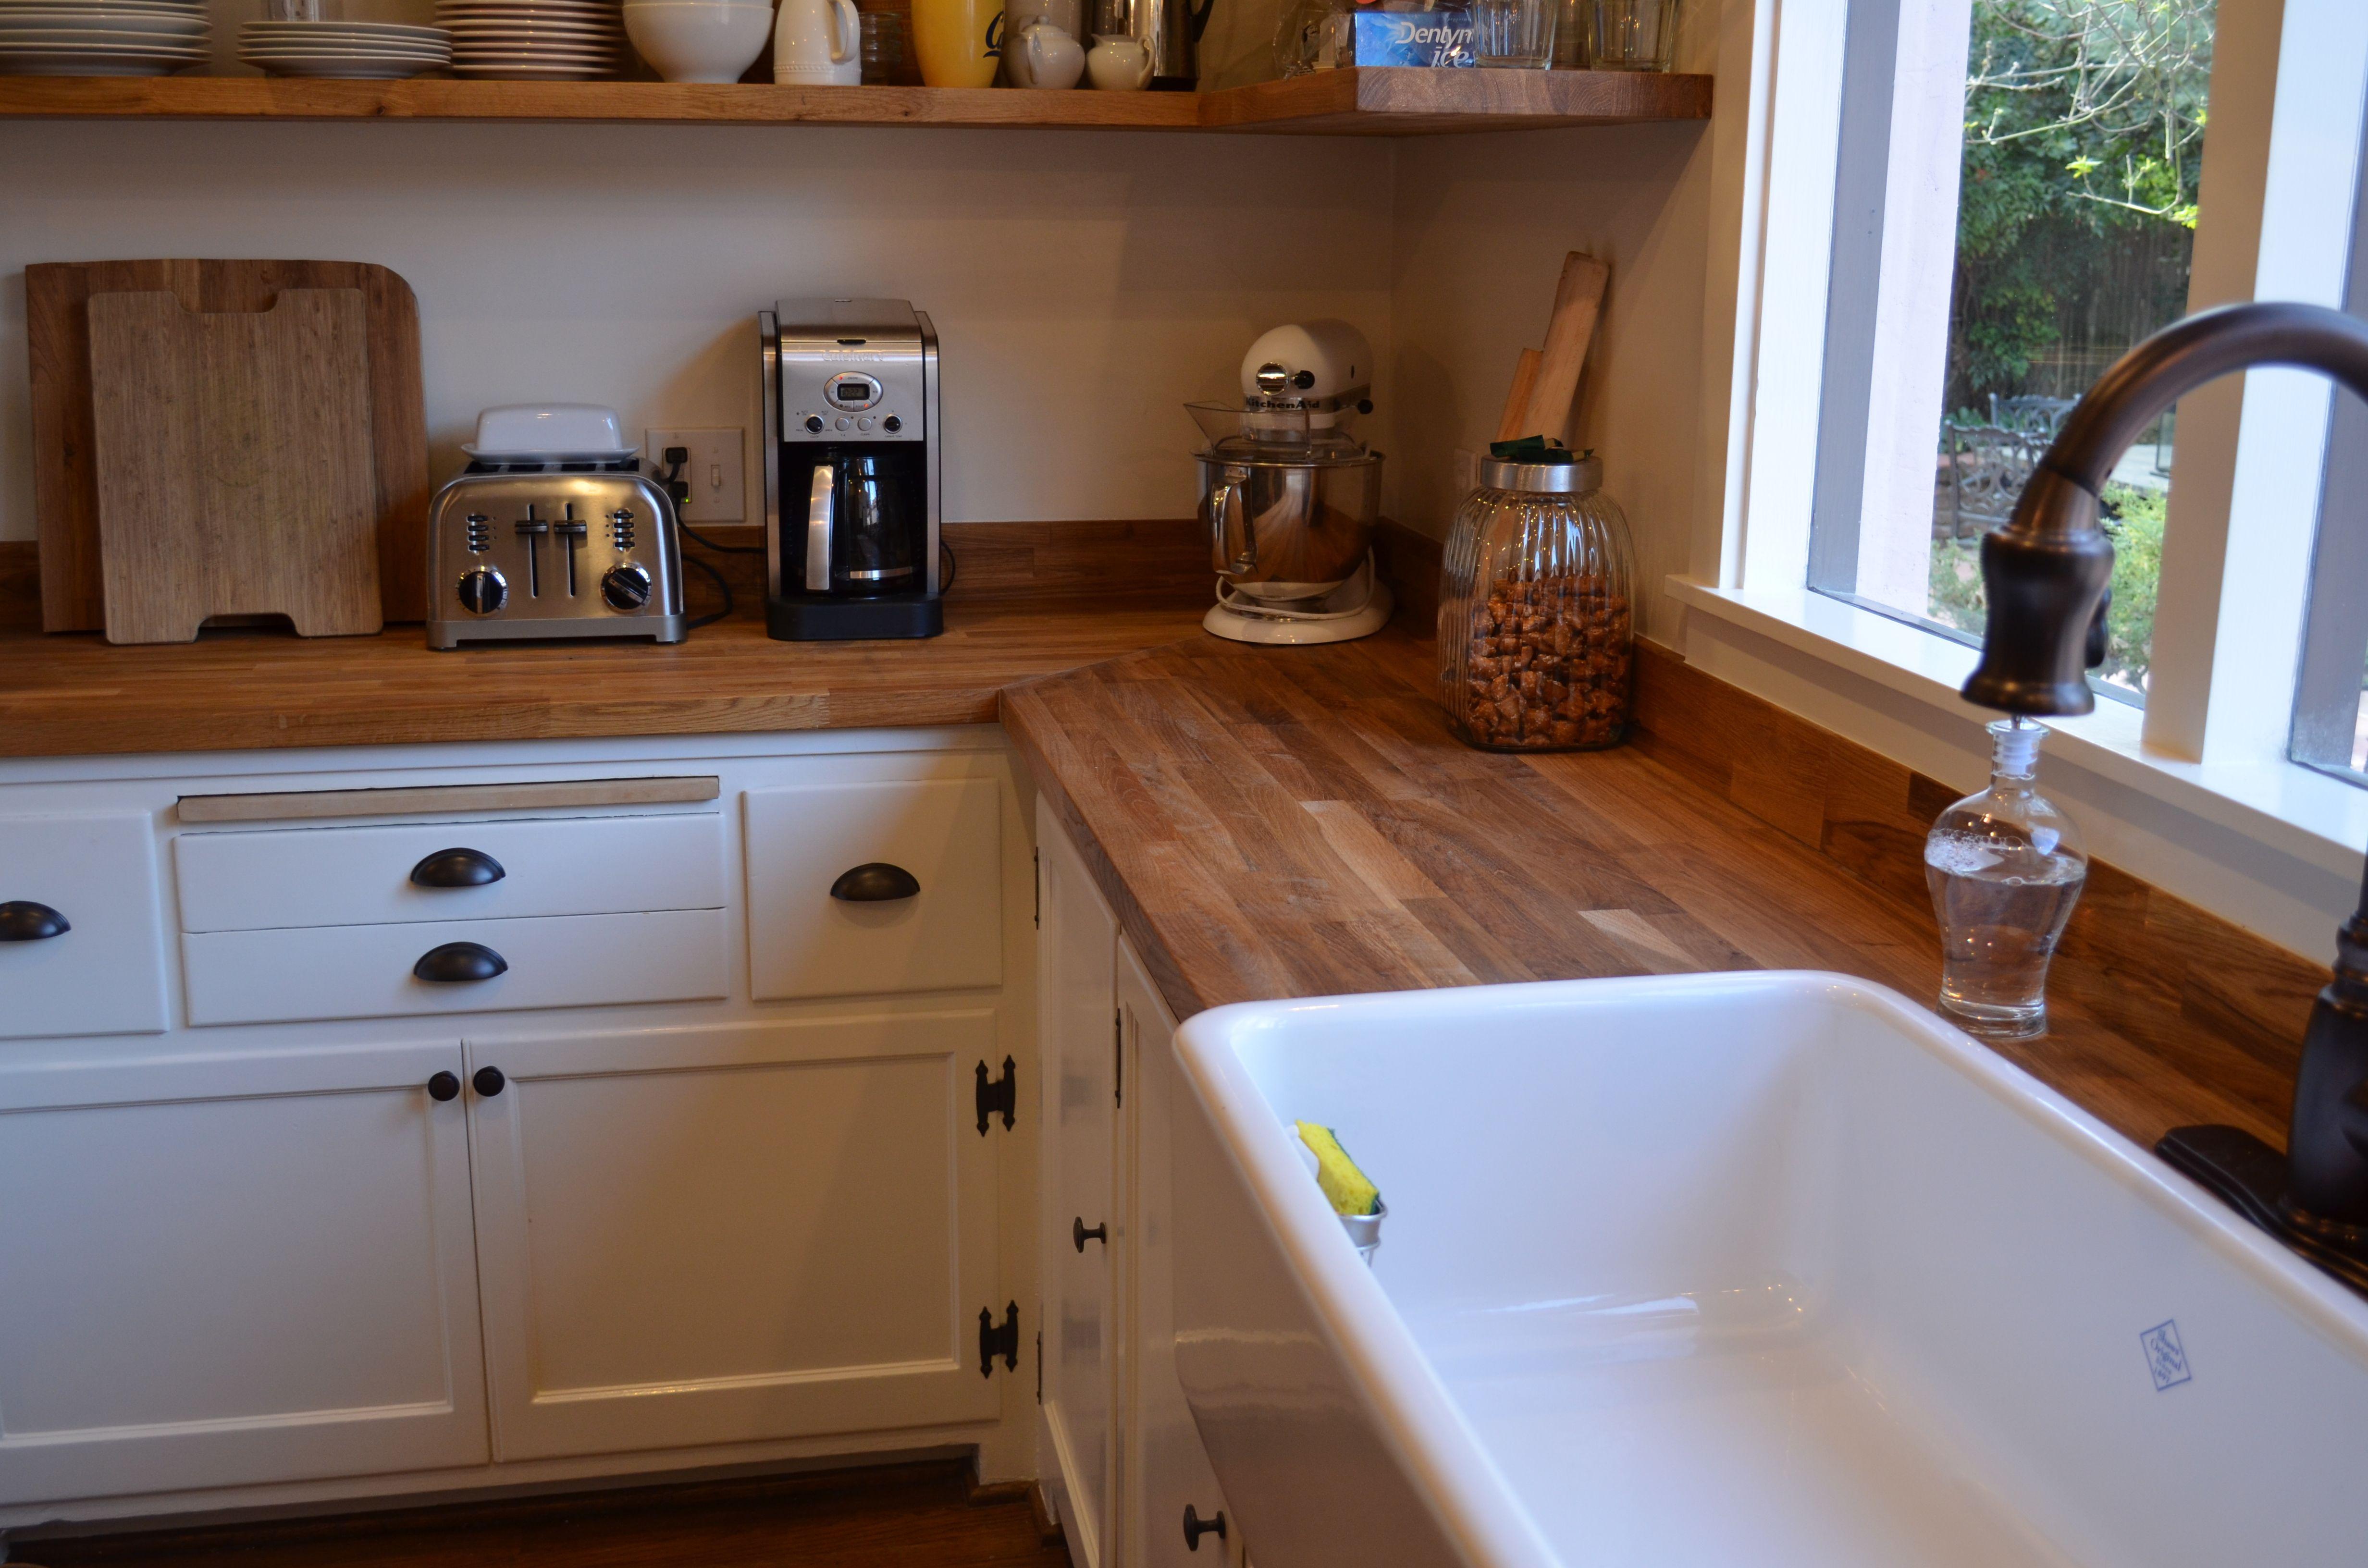 Woodem Butcher Block Countertops Plus White Sink Plus Cabinet For